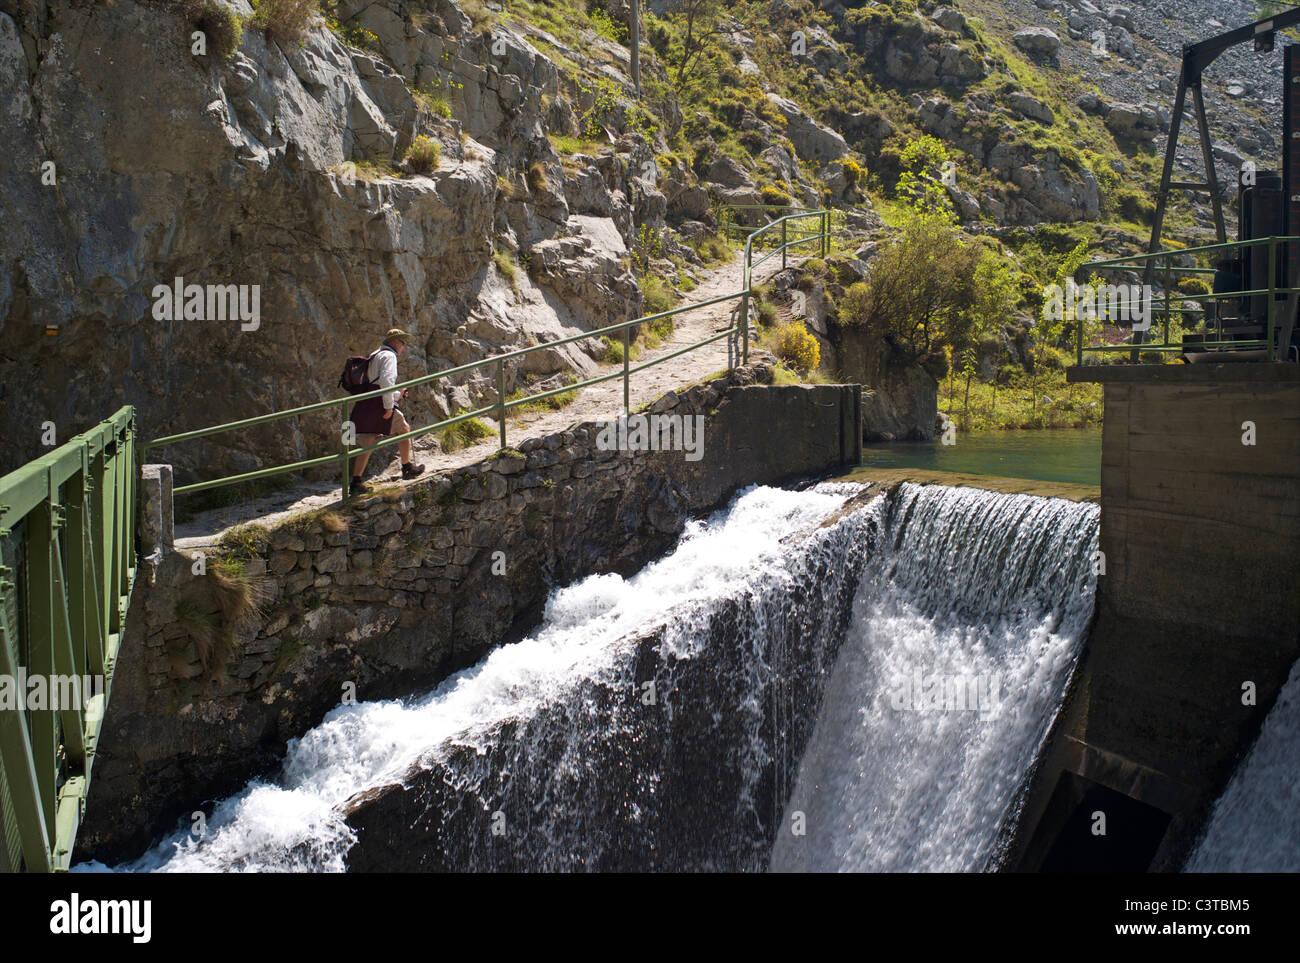 Walking the Cares Gorge footpath near Cain, Picos de Europa, Castilla y Leon, Spain - Stock Image